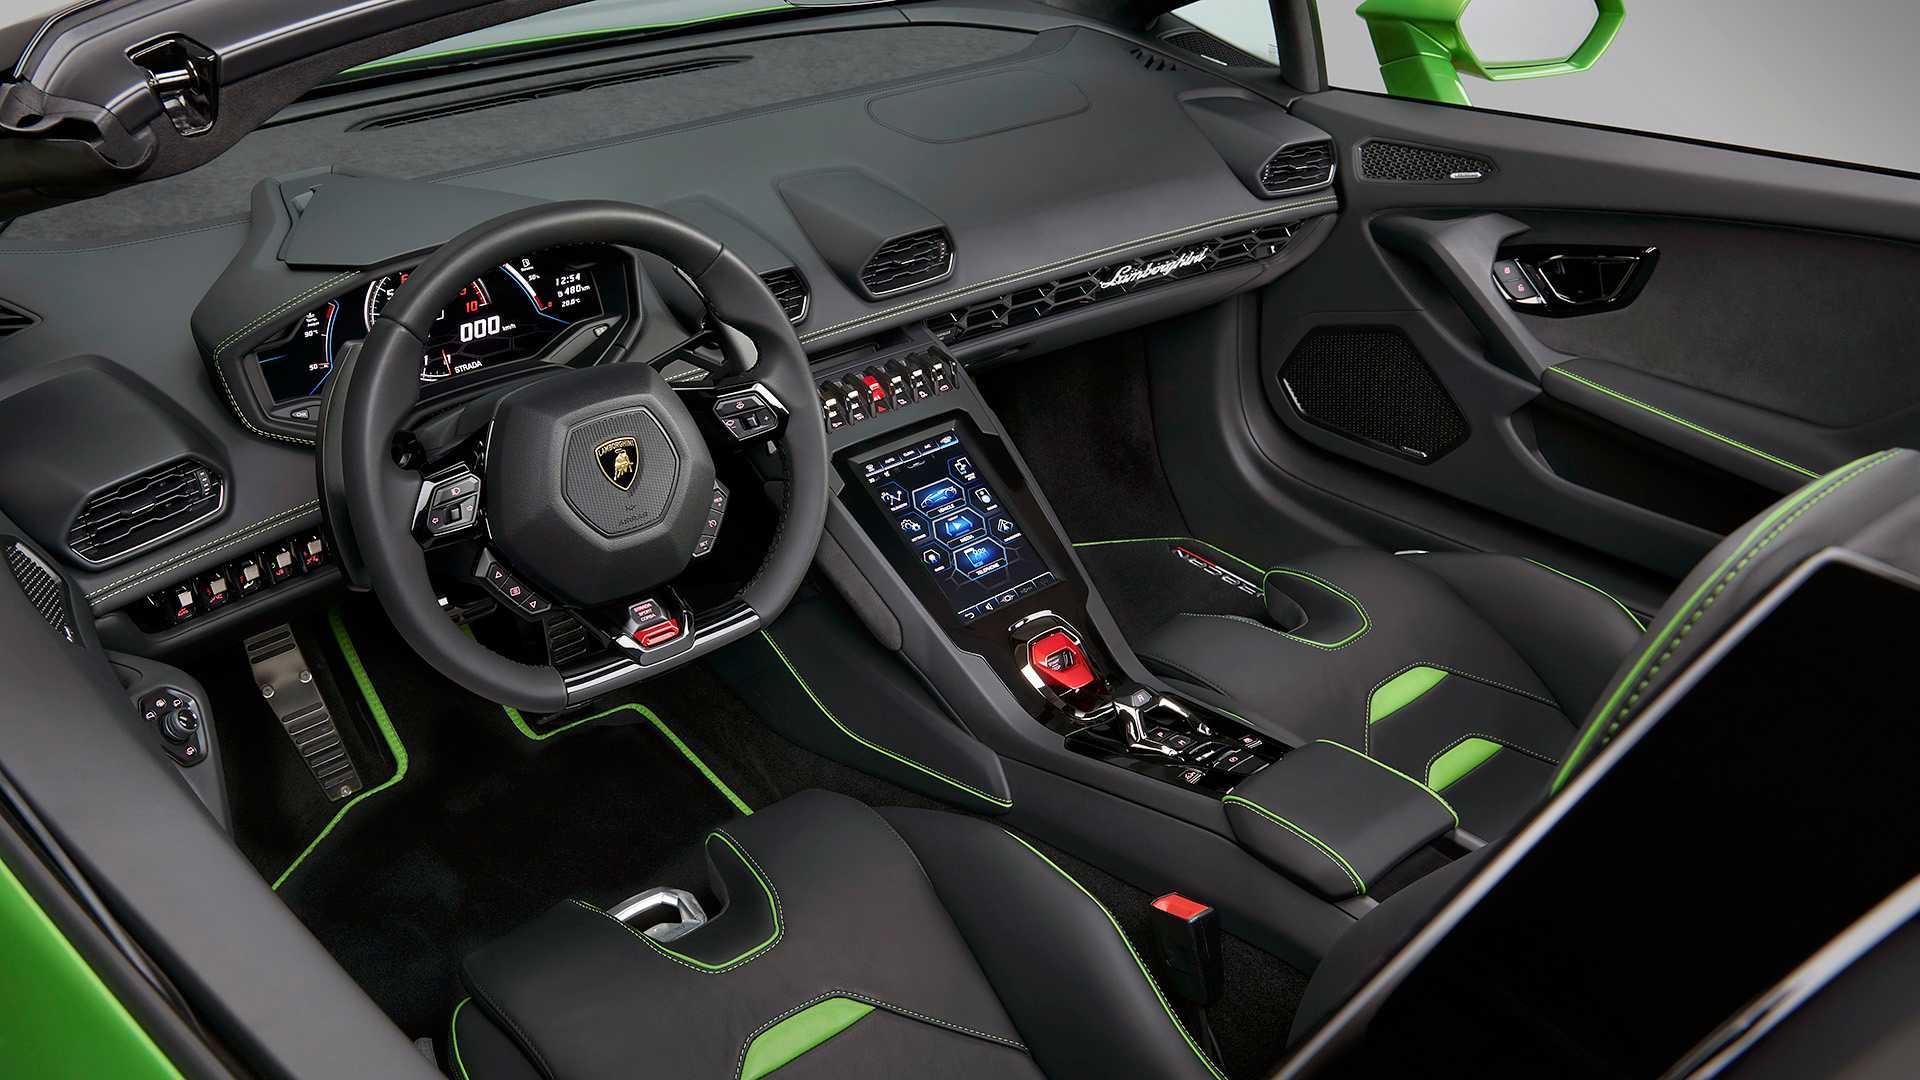 2019 Lamborghini Huracán EVO Spyder Interior Cockpit